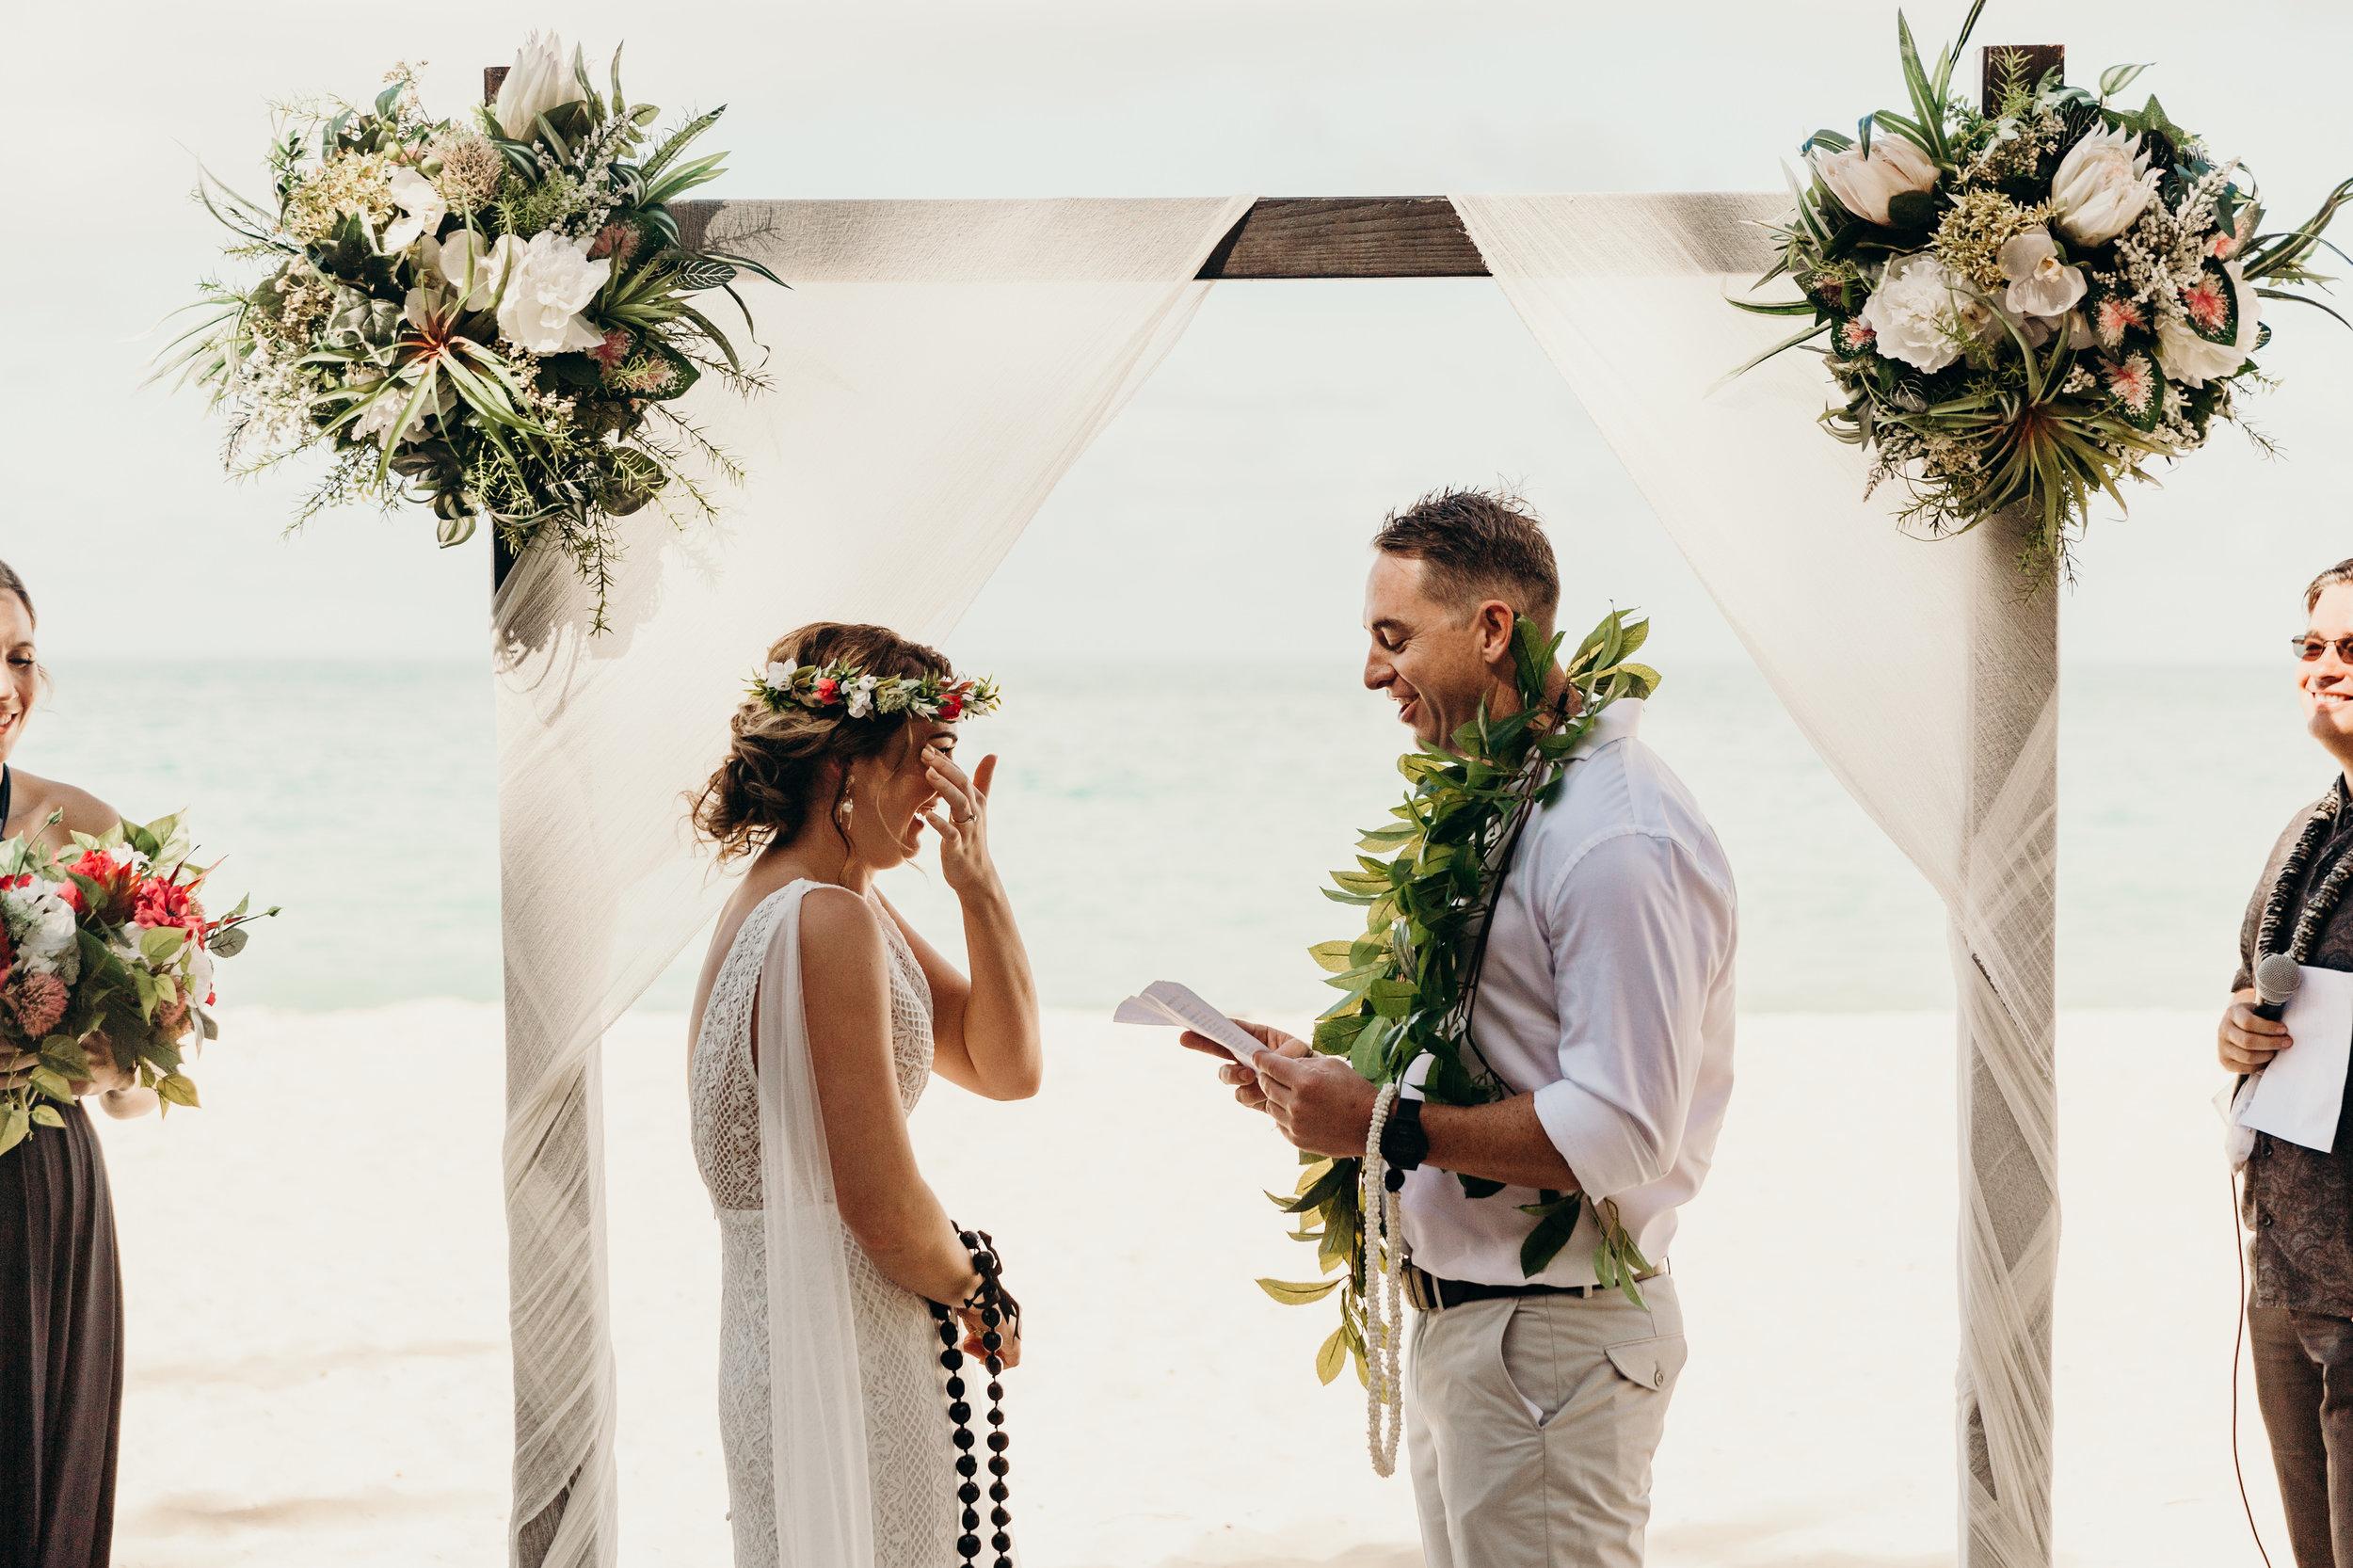 HAWAII-WEDDING-PHOTOGRAPHER-ALOHILANI-RESORT-KEANI-BAKULA-33.jpg